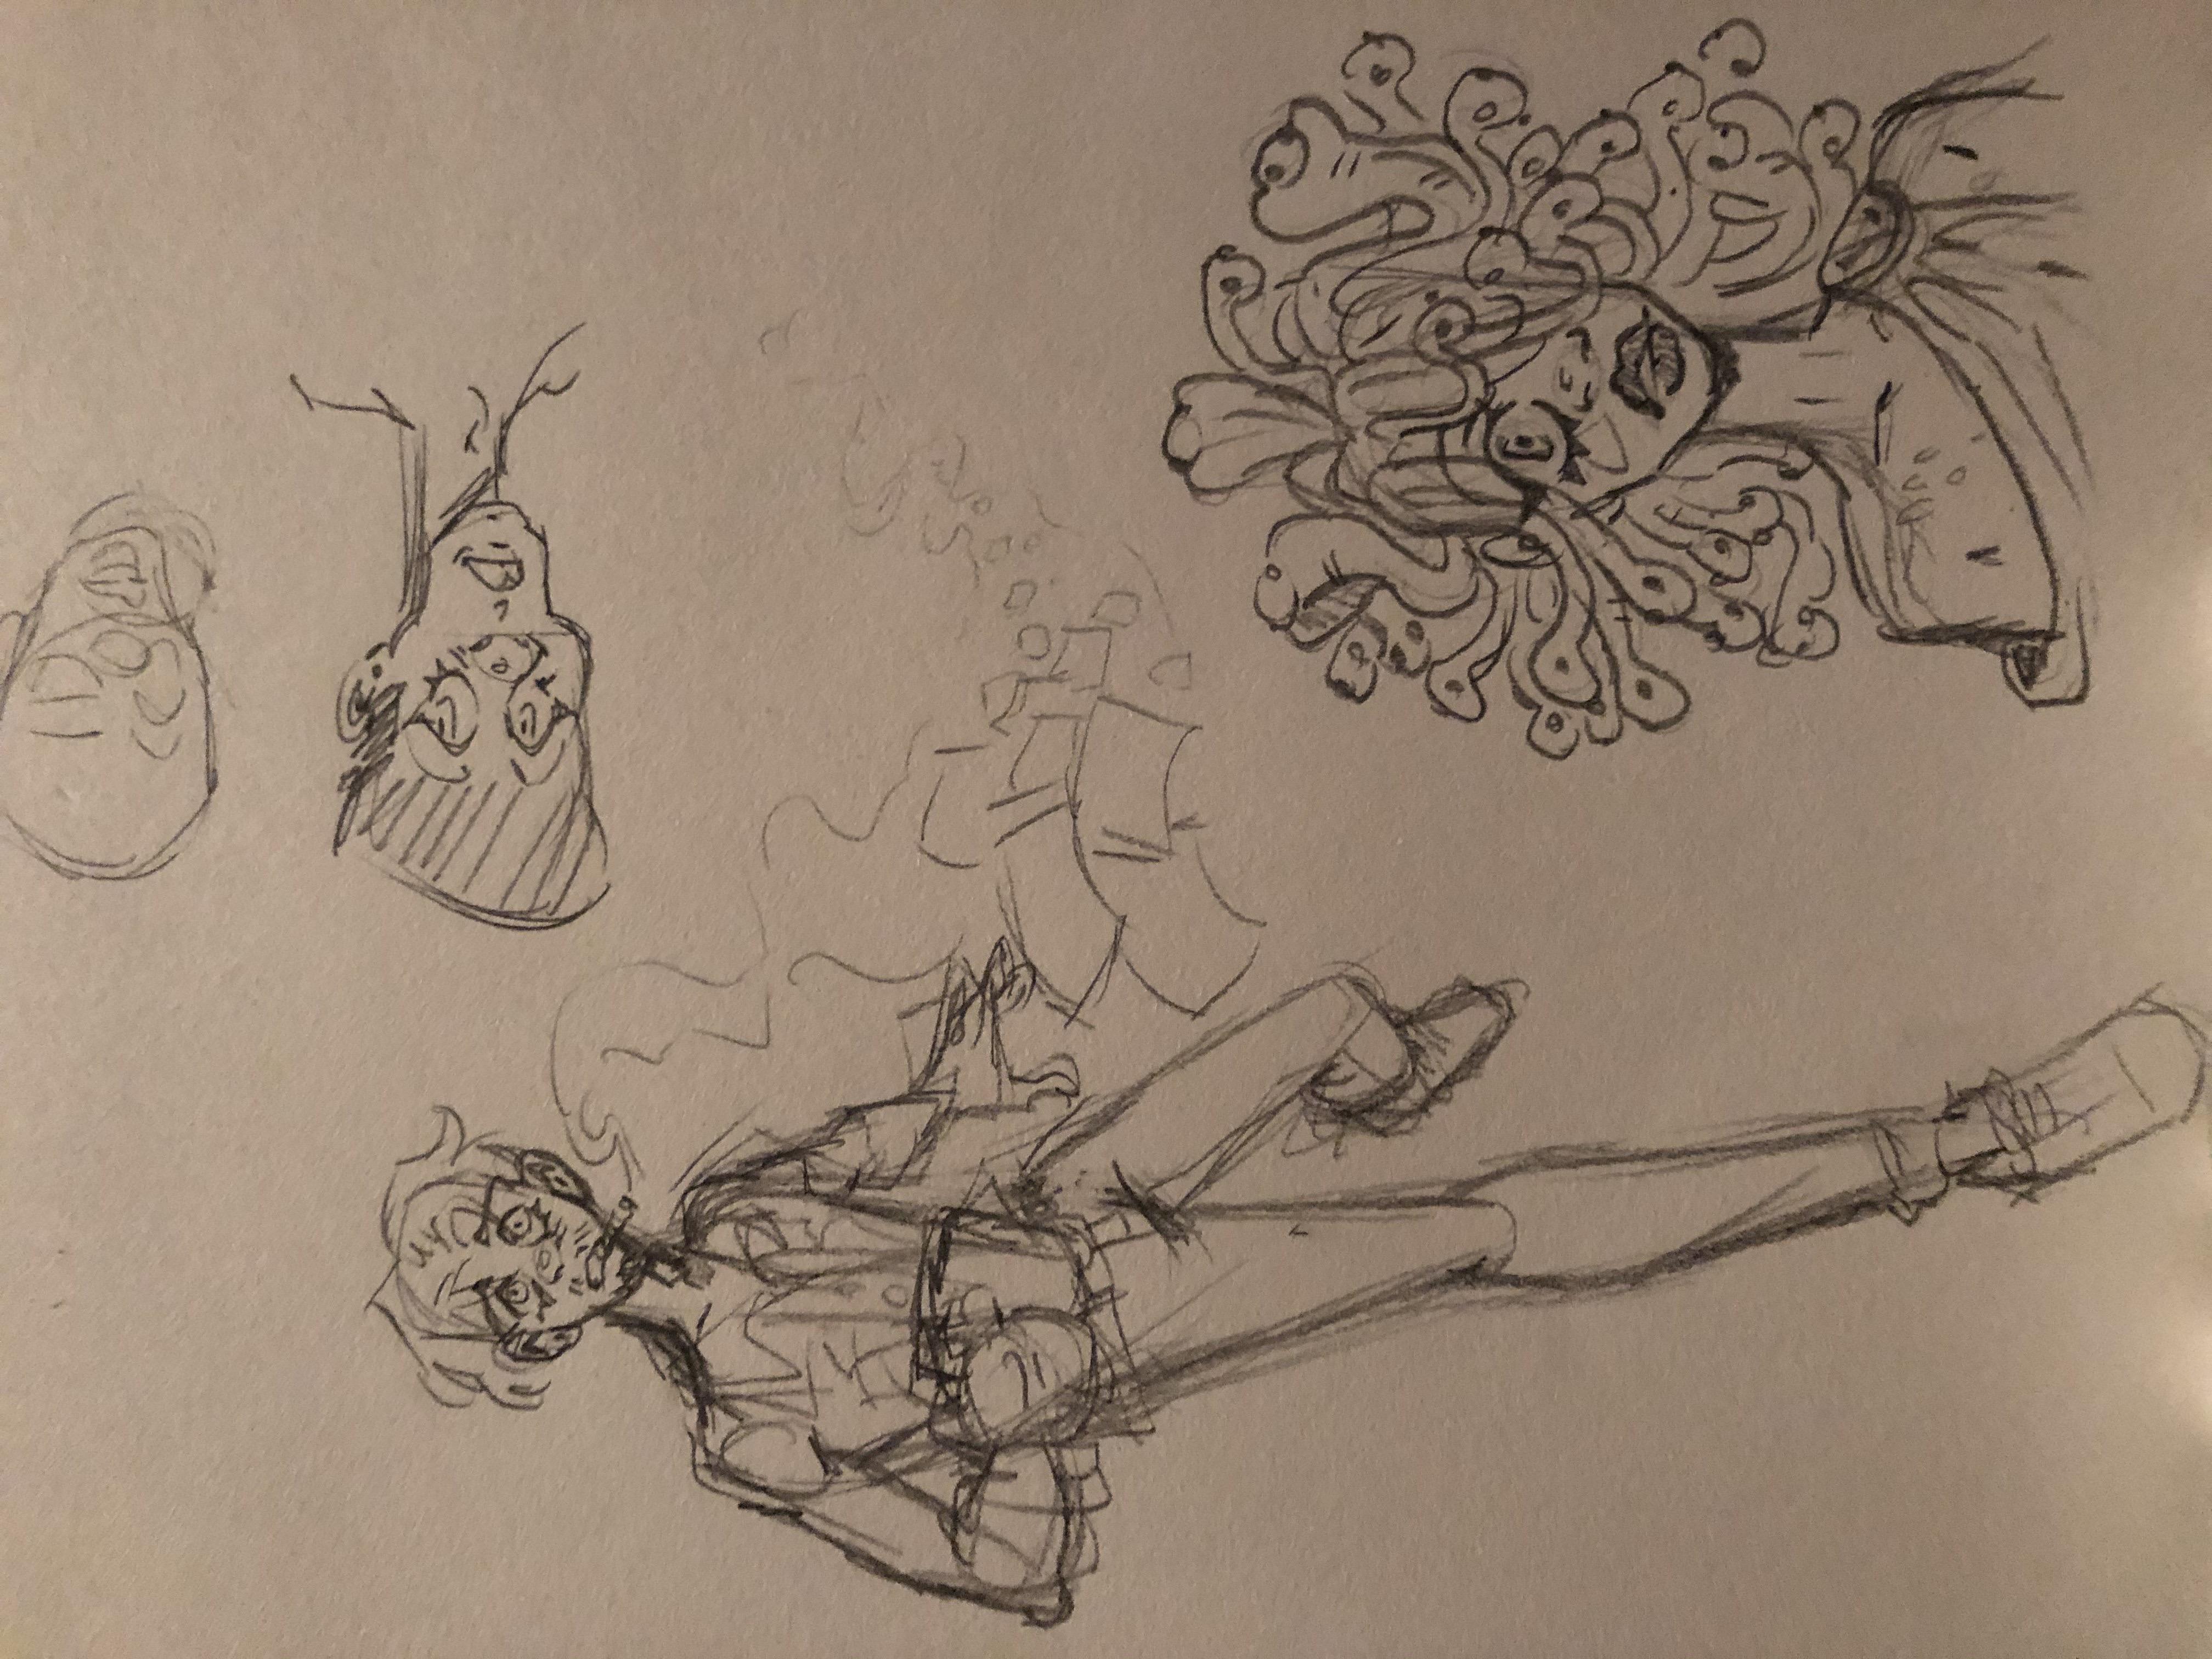 Even more doodles